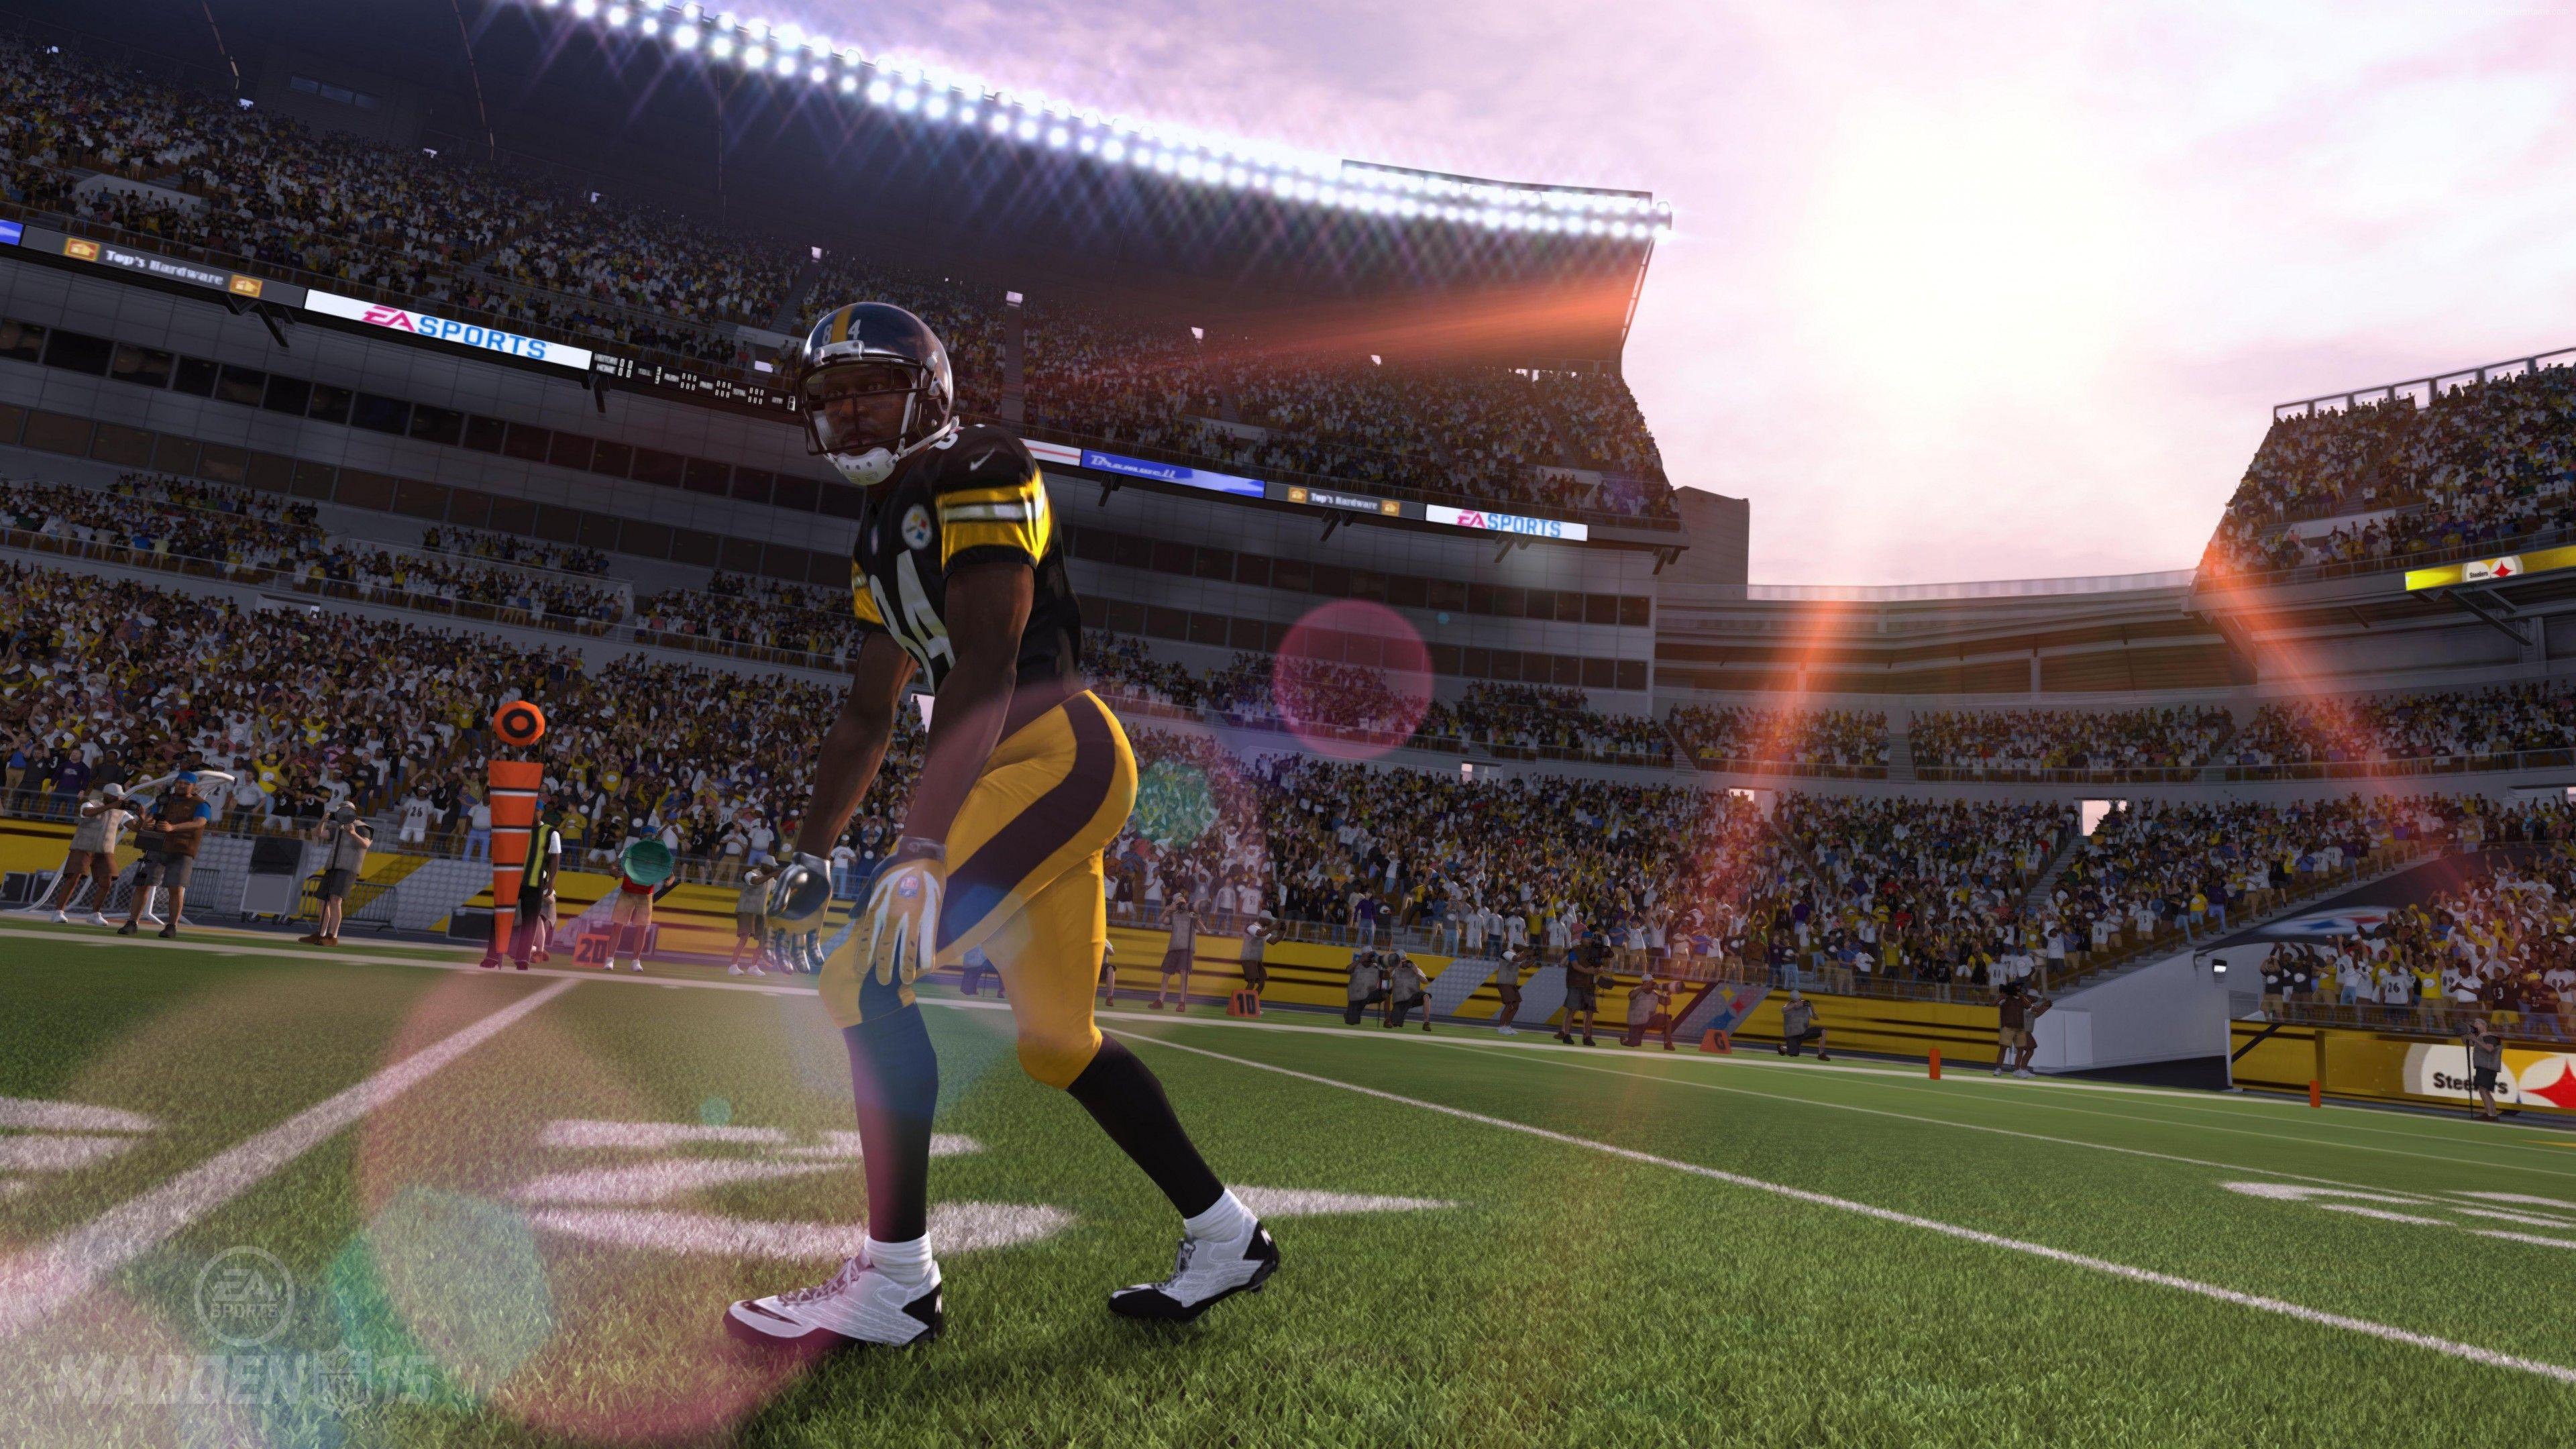 Wallpaper Madden NFL 15, american football, sports game